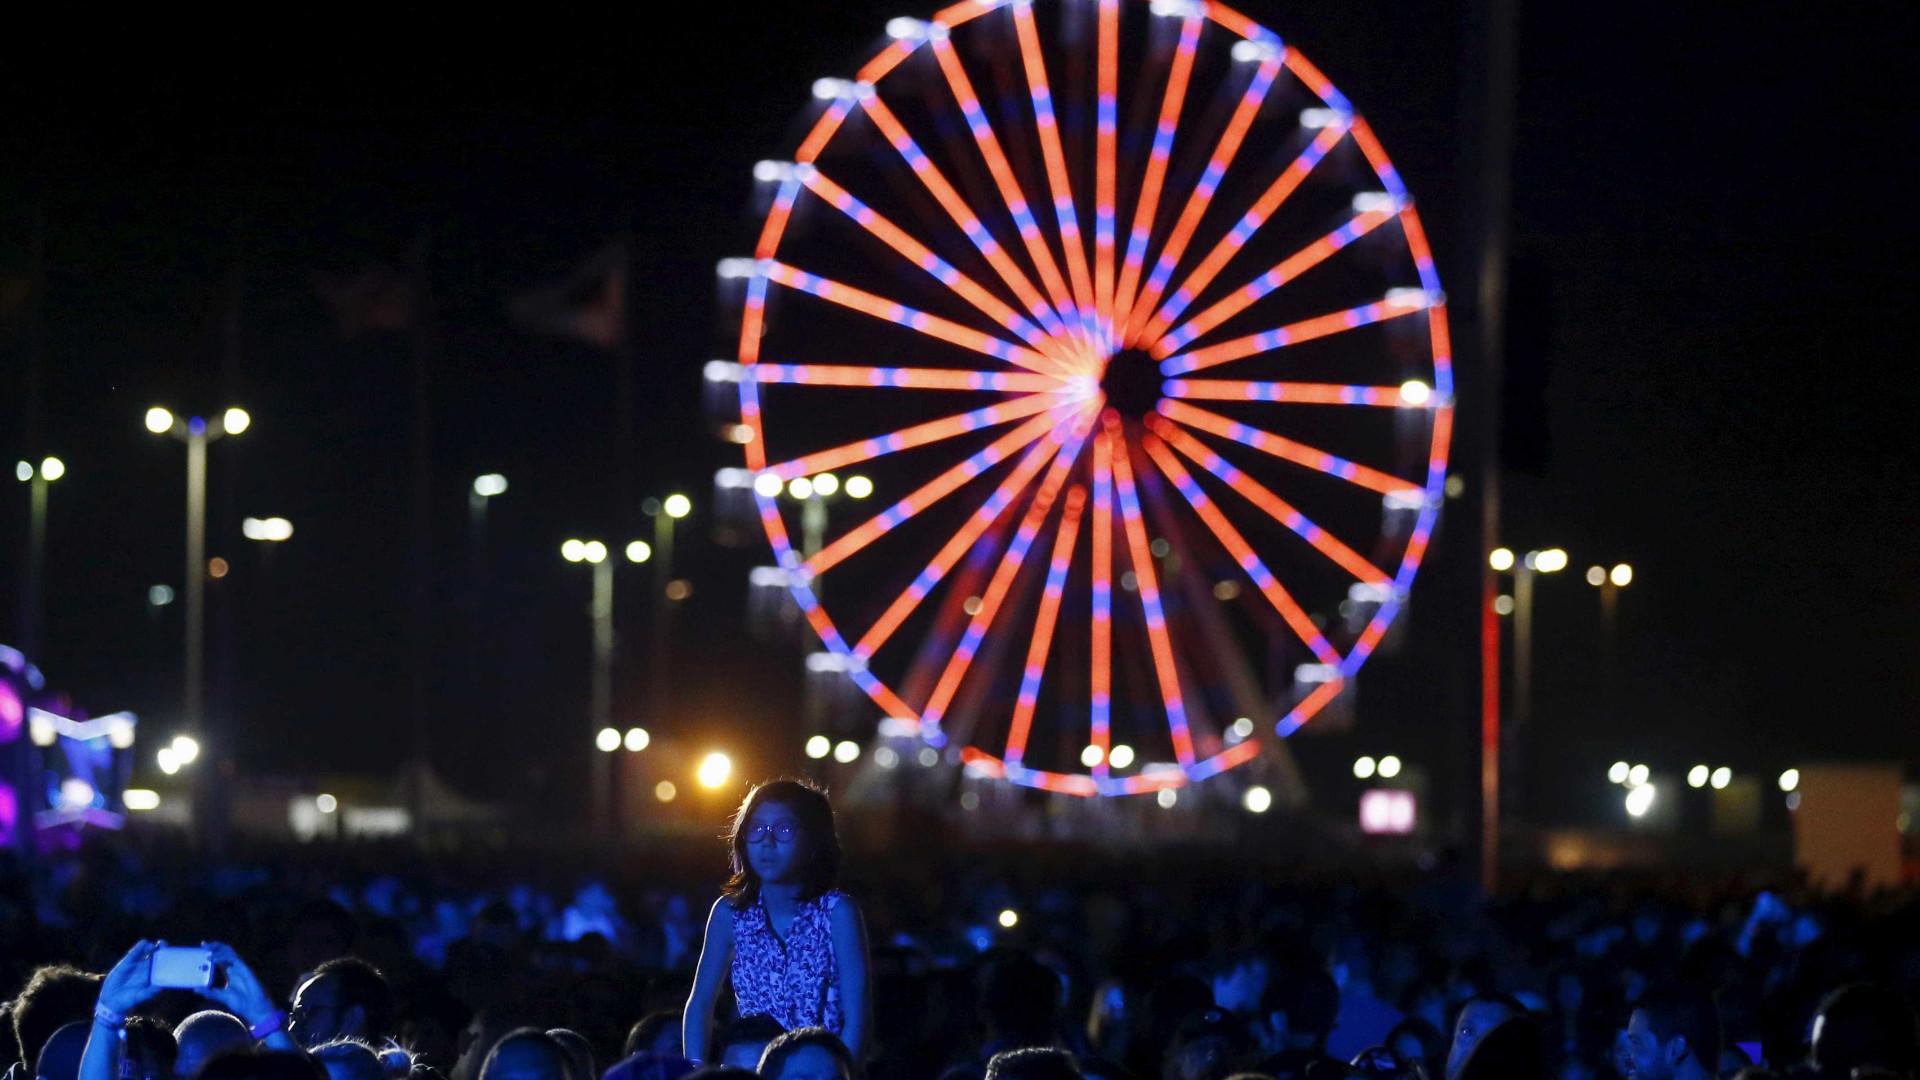 Rock in Rio divulga data para o início das vendas de ingressos